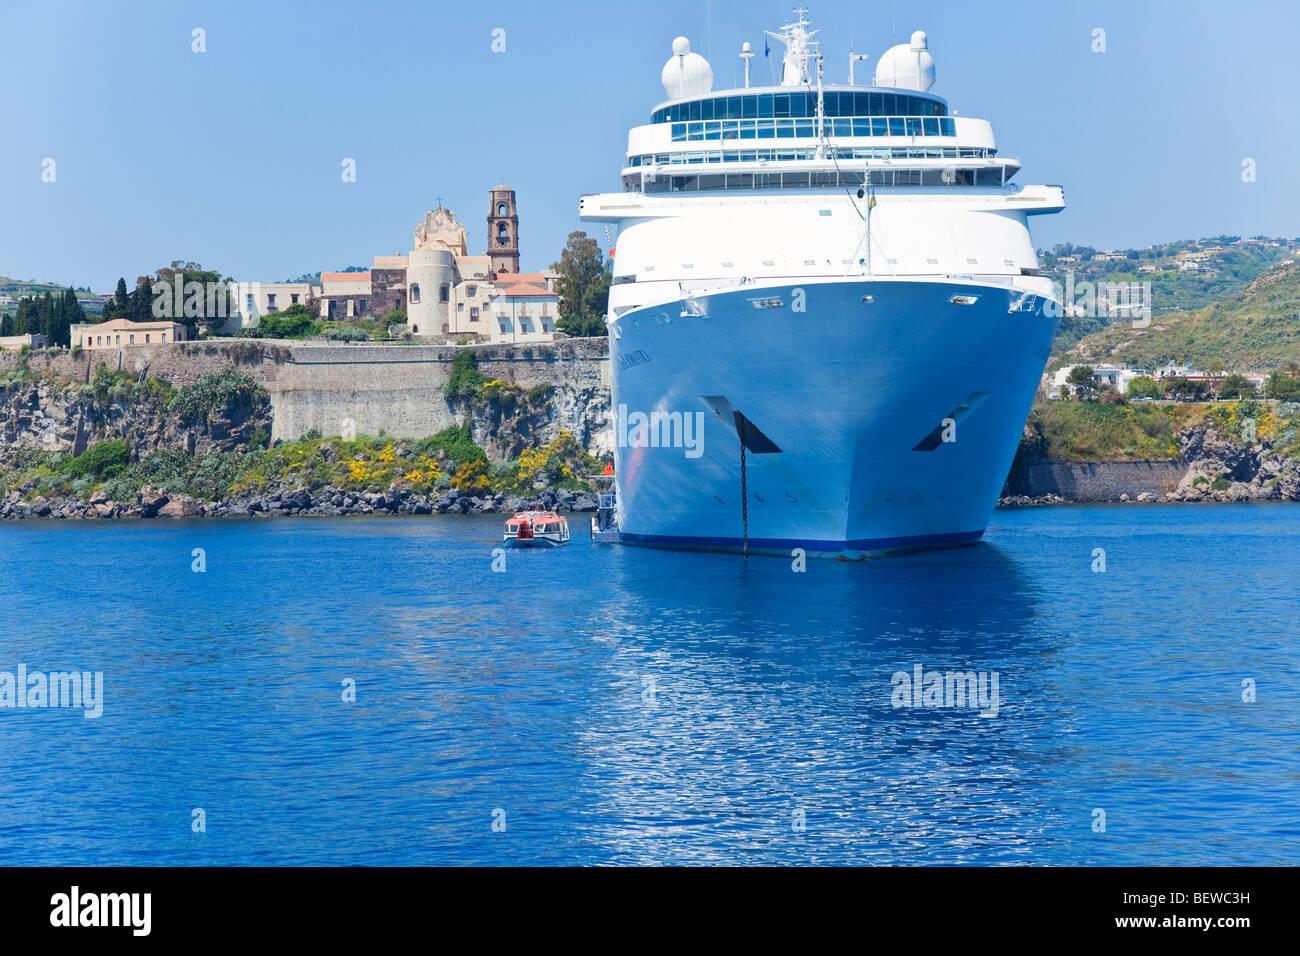 Cruise liner Cost Romantica before Lipari, Italy - Stock Image